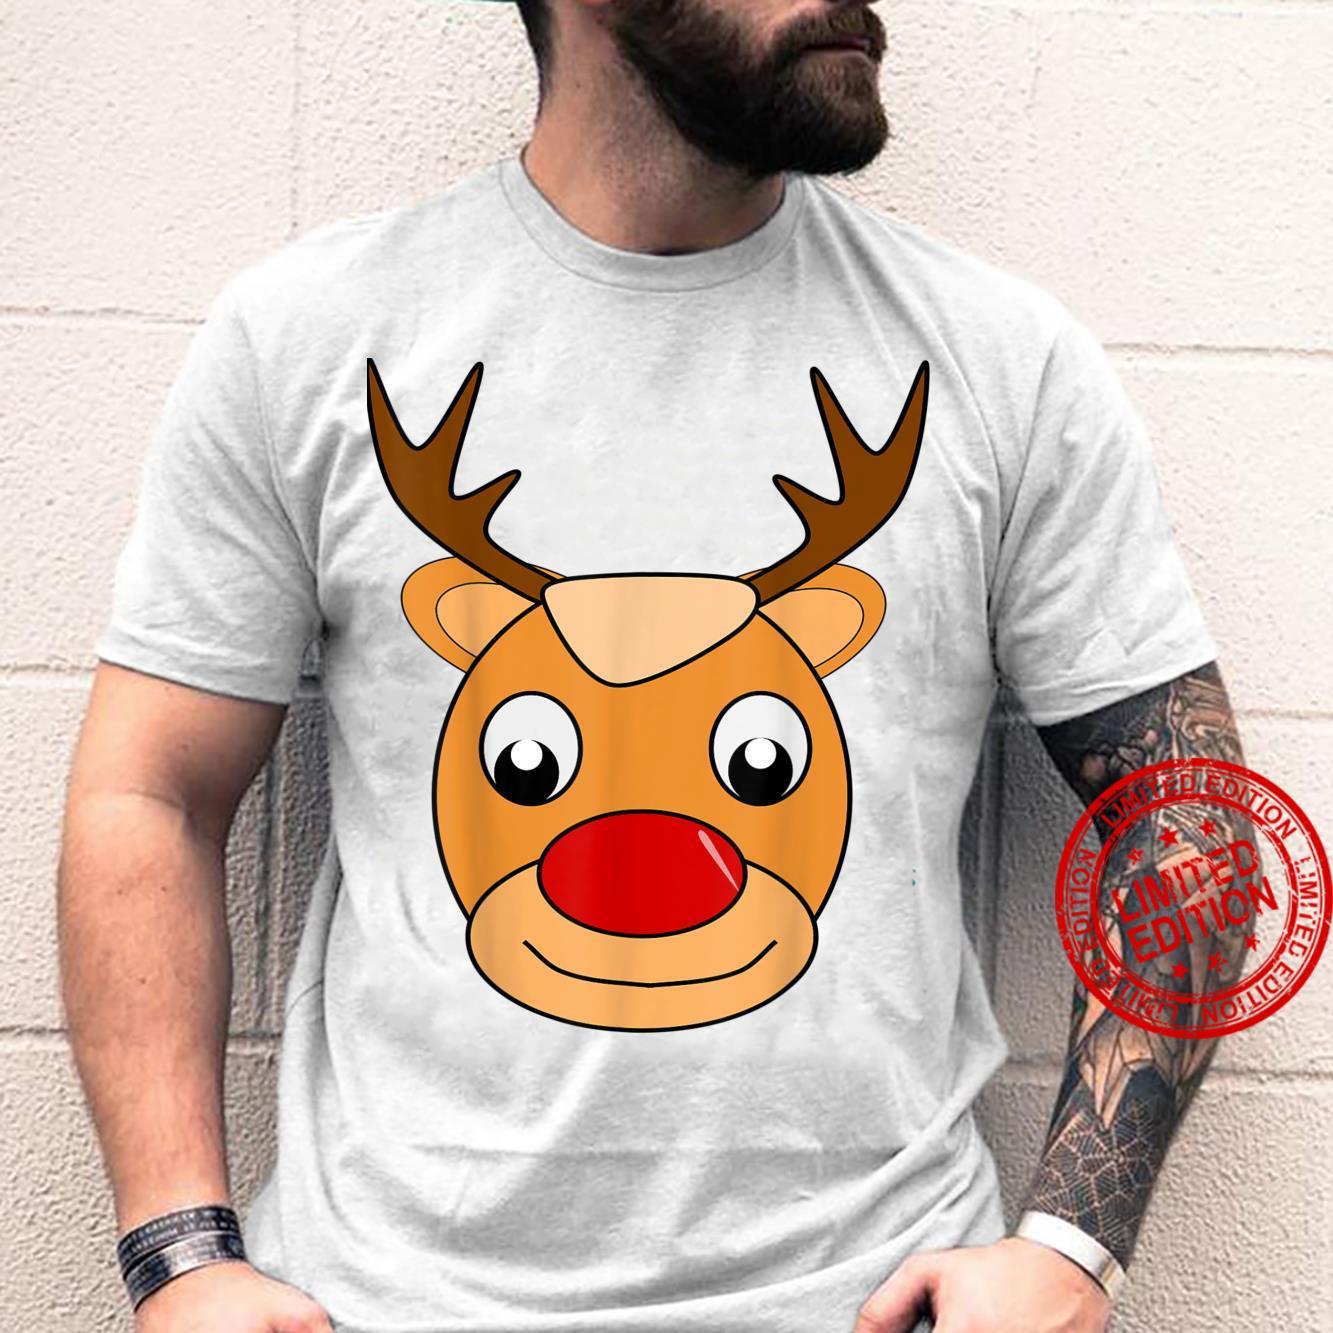 Red Nose Reindeer Shirt